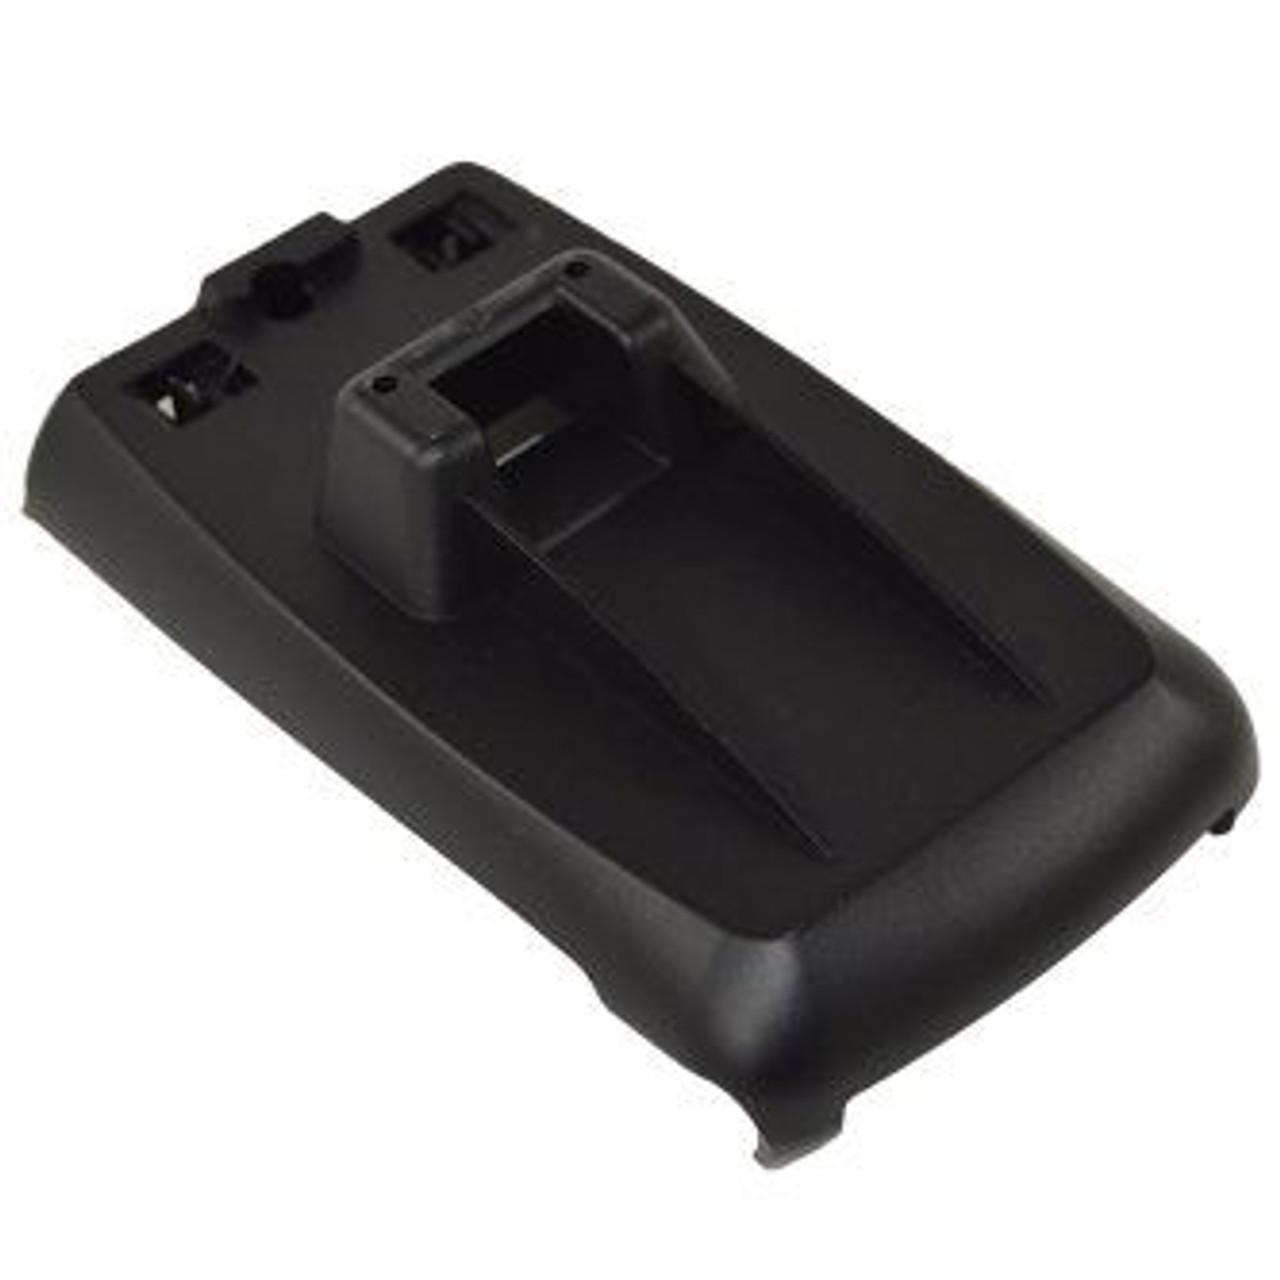 Dejavoo Z3 and Z6 FlexiPole POS Drive-Thru Handle